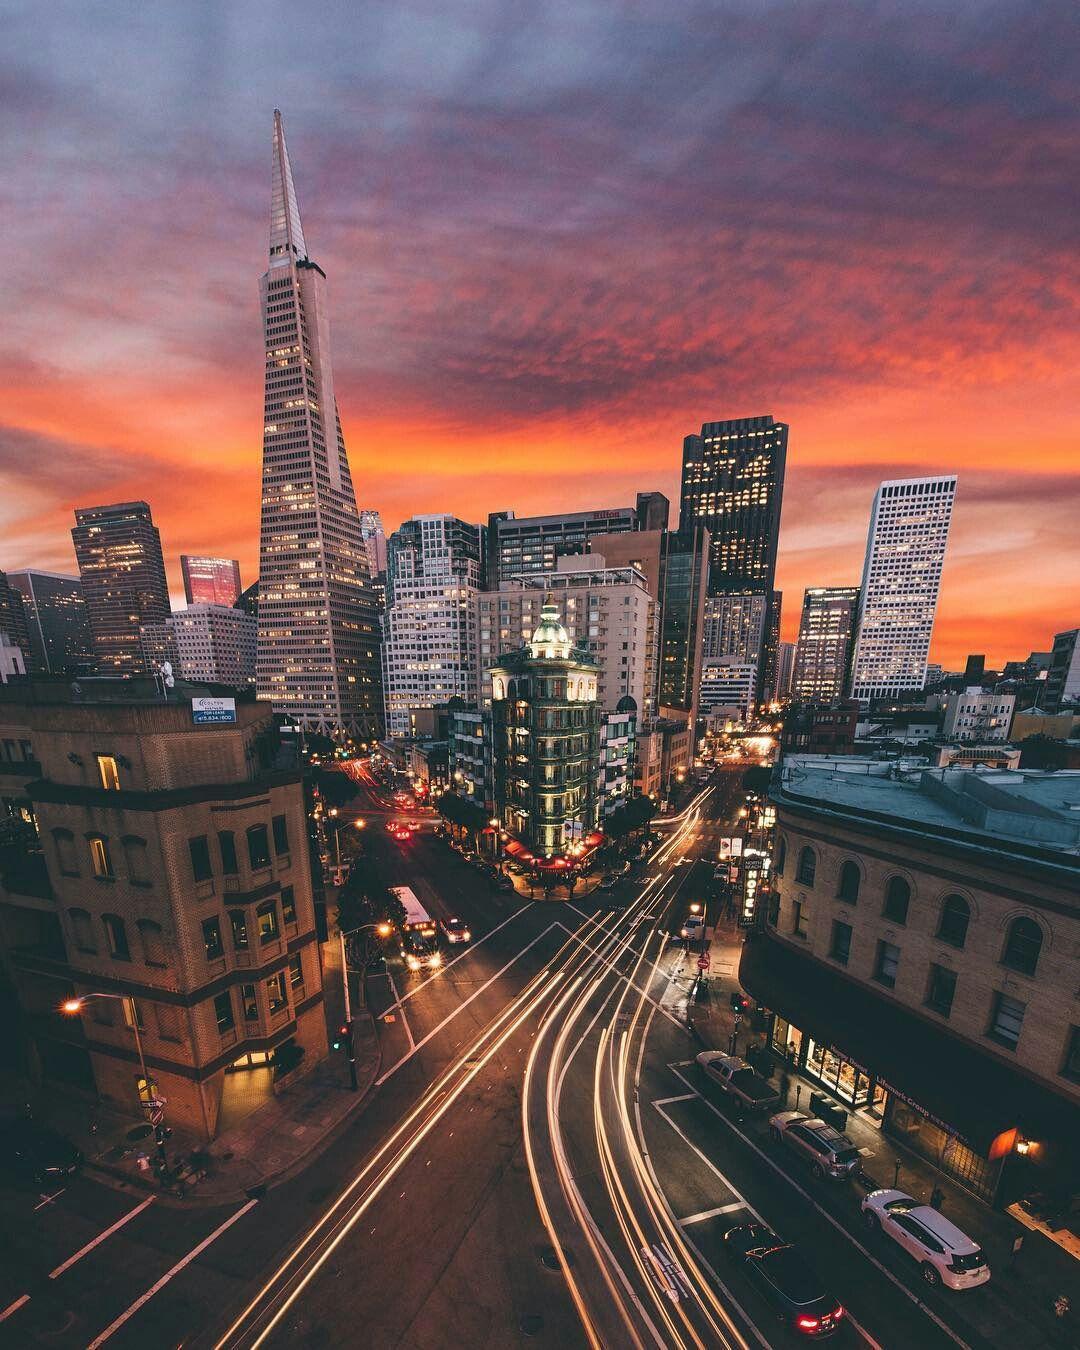 Golden gate San Francisco by uwo